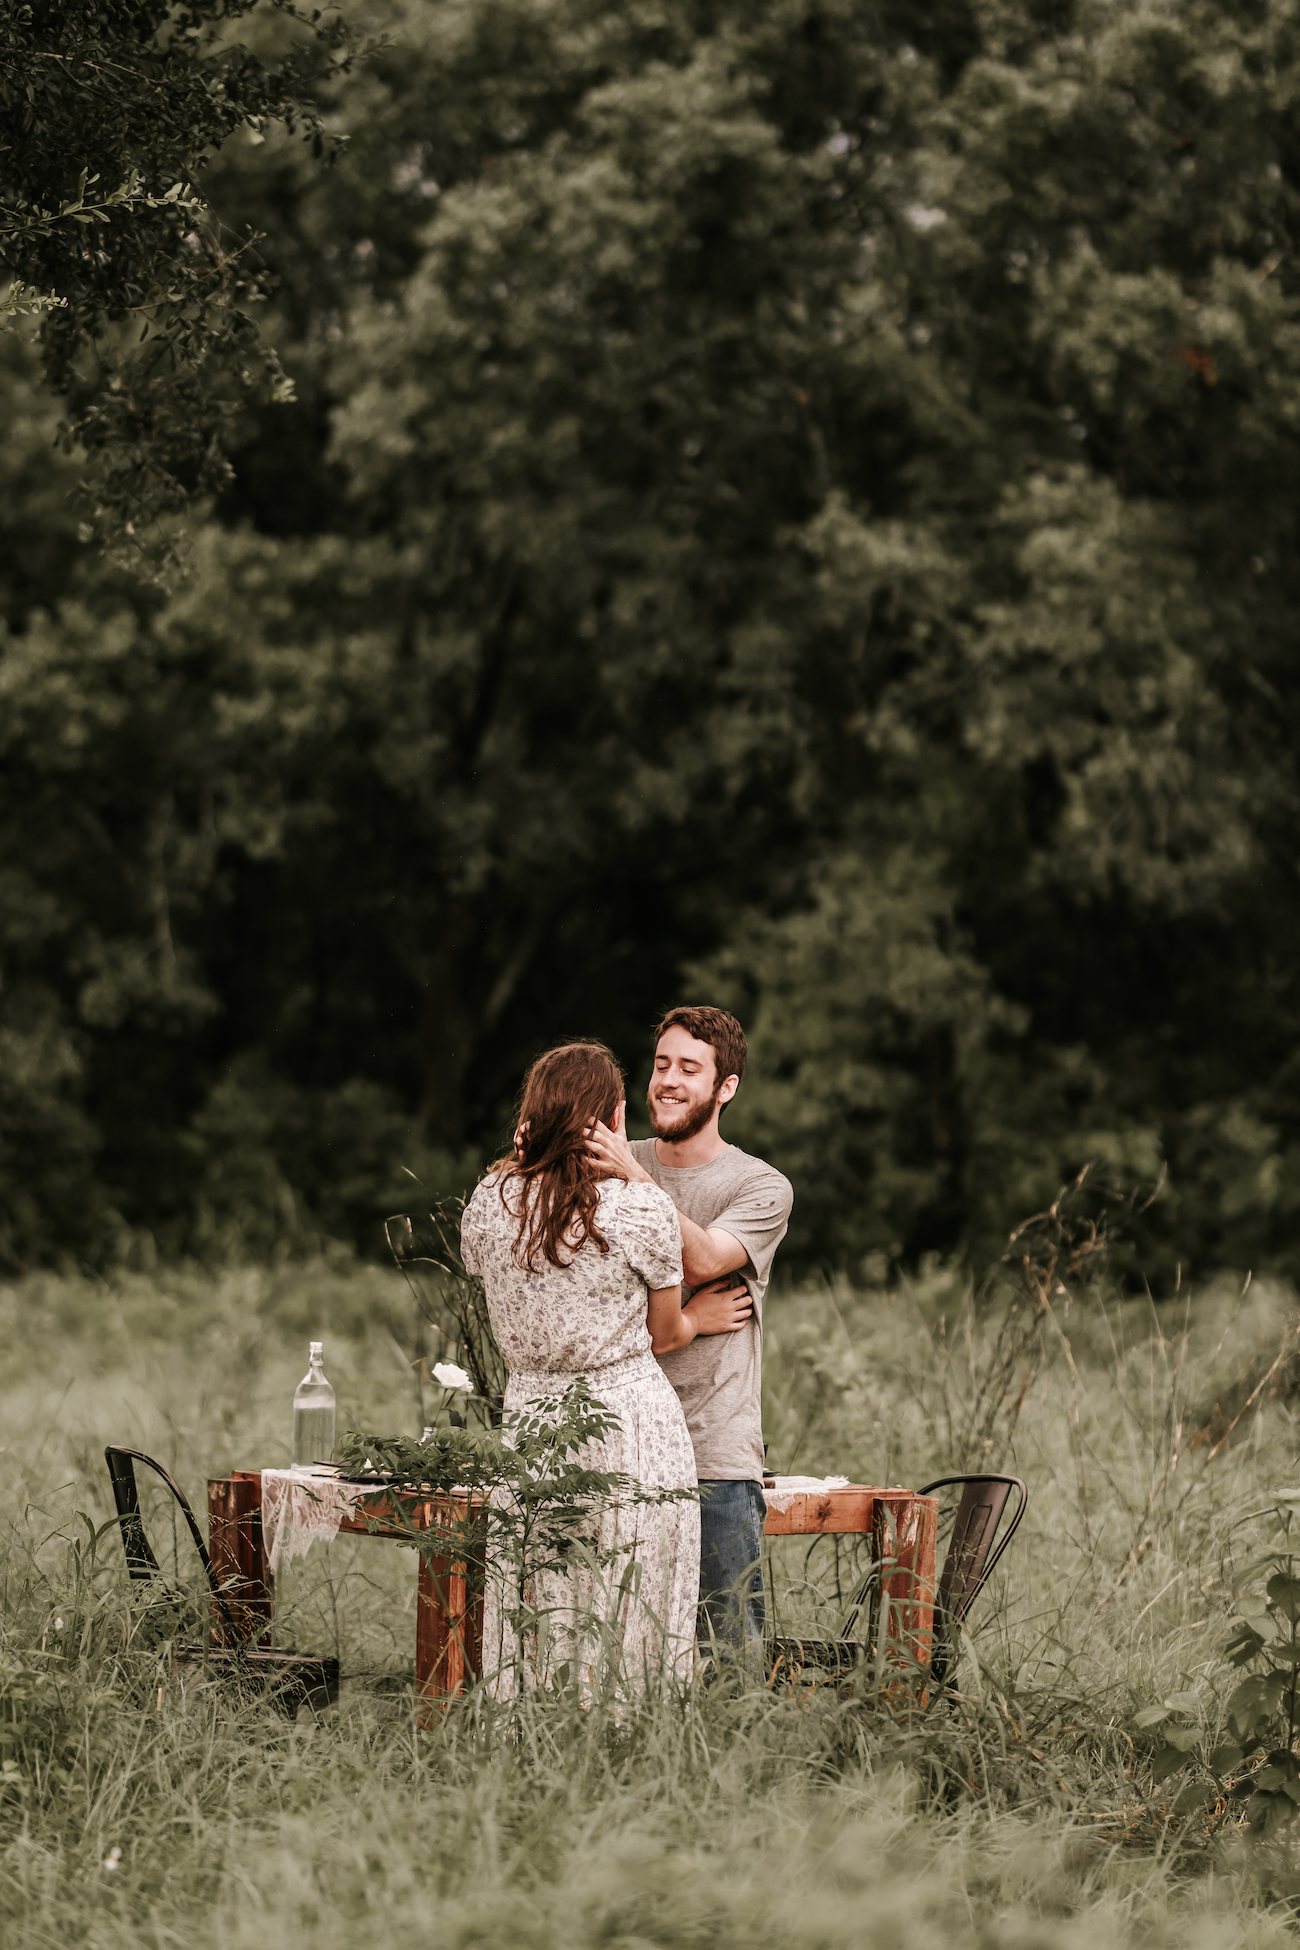 tampa-engagement-proposal-photography-63.jpeg